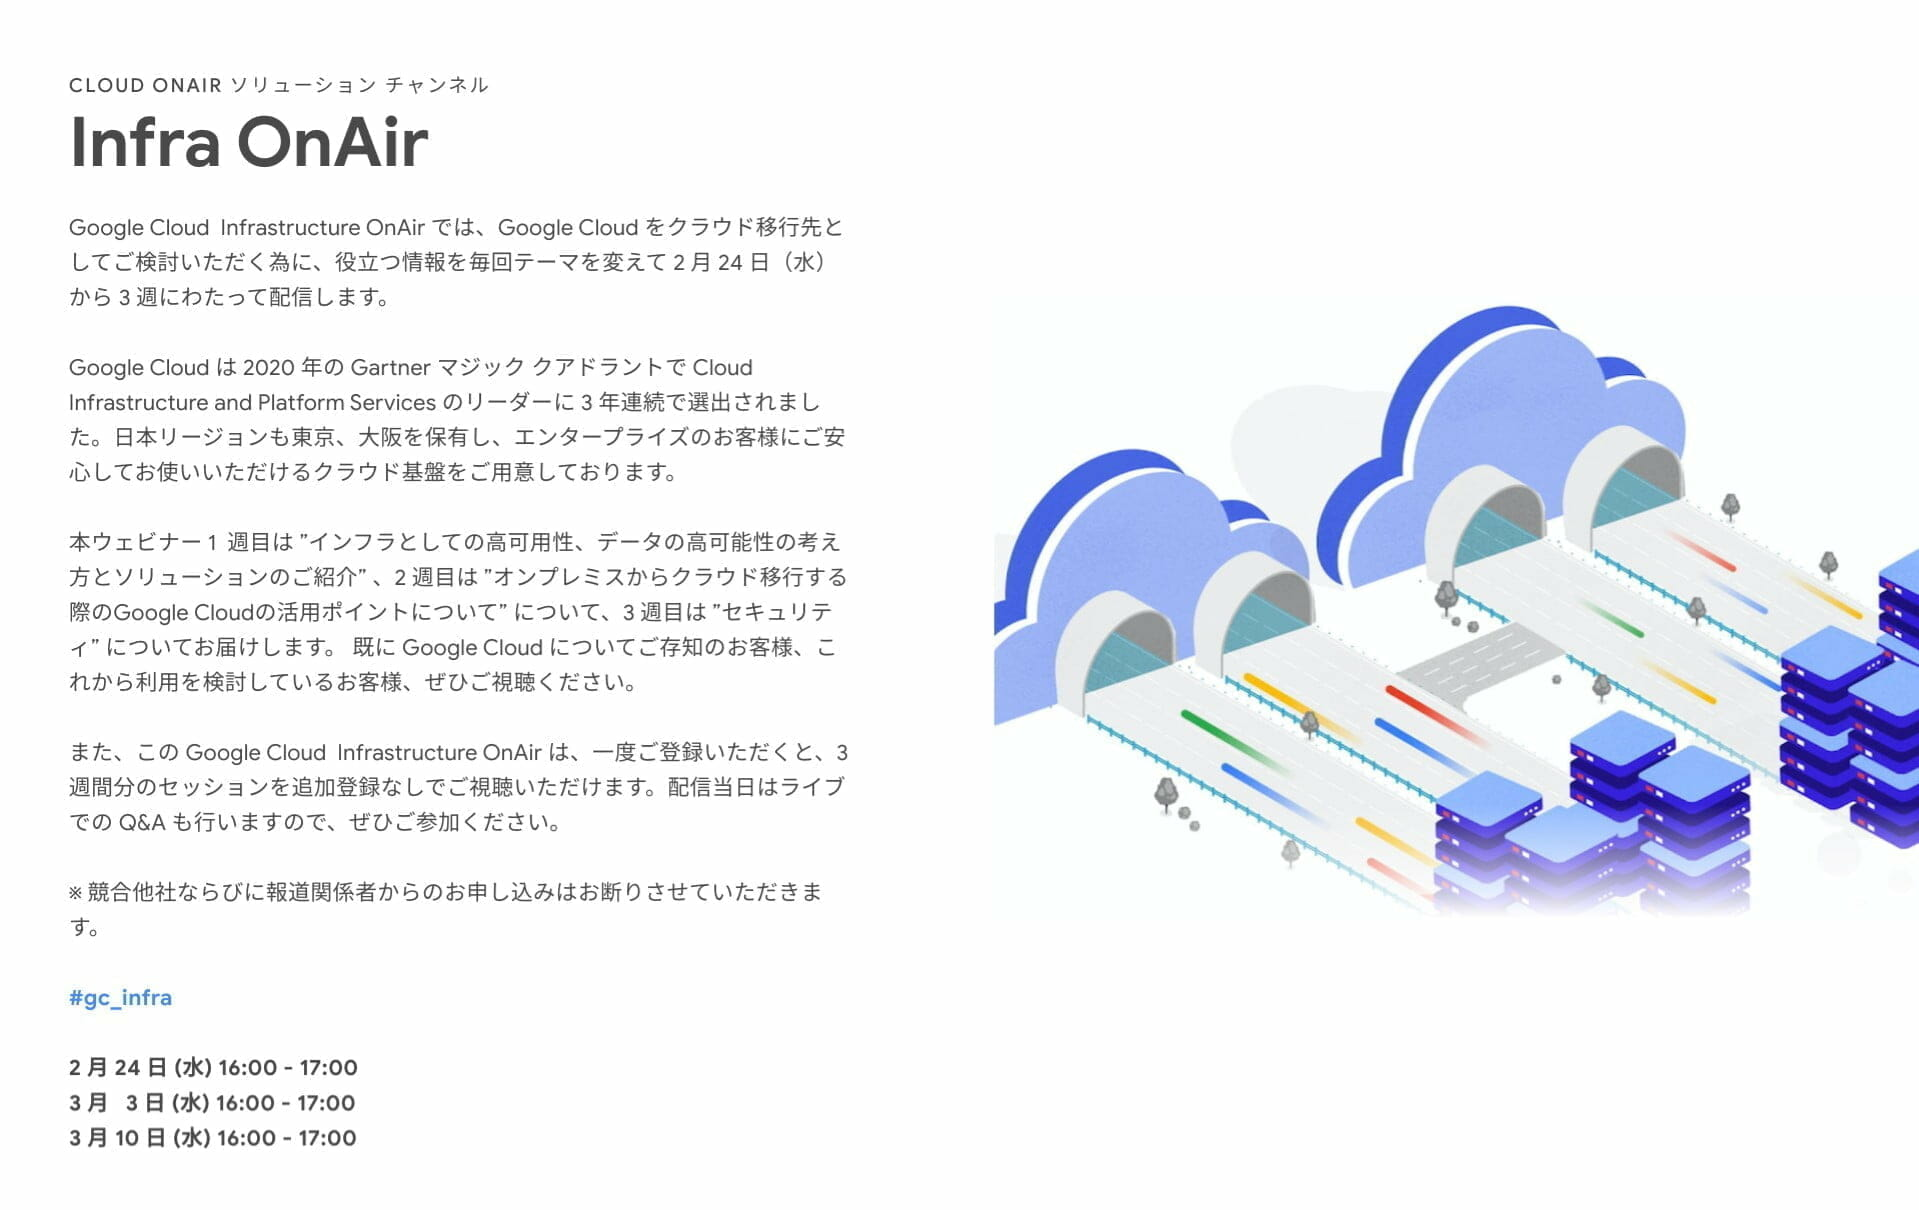 [GCP] Google Cloud Infrastructure OnAir